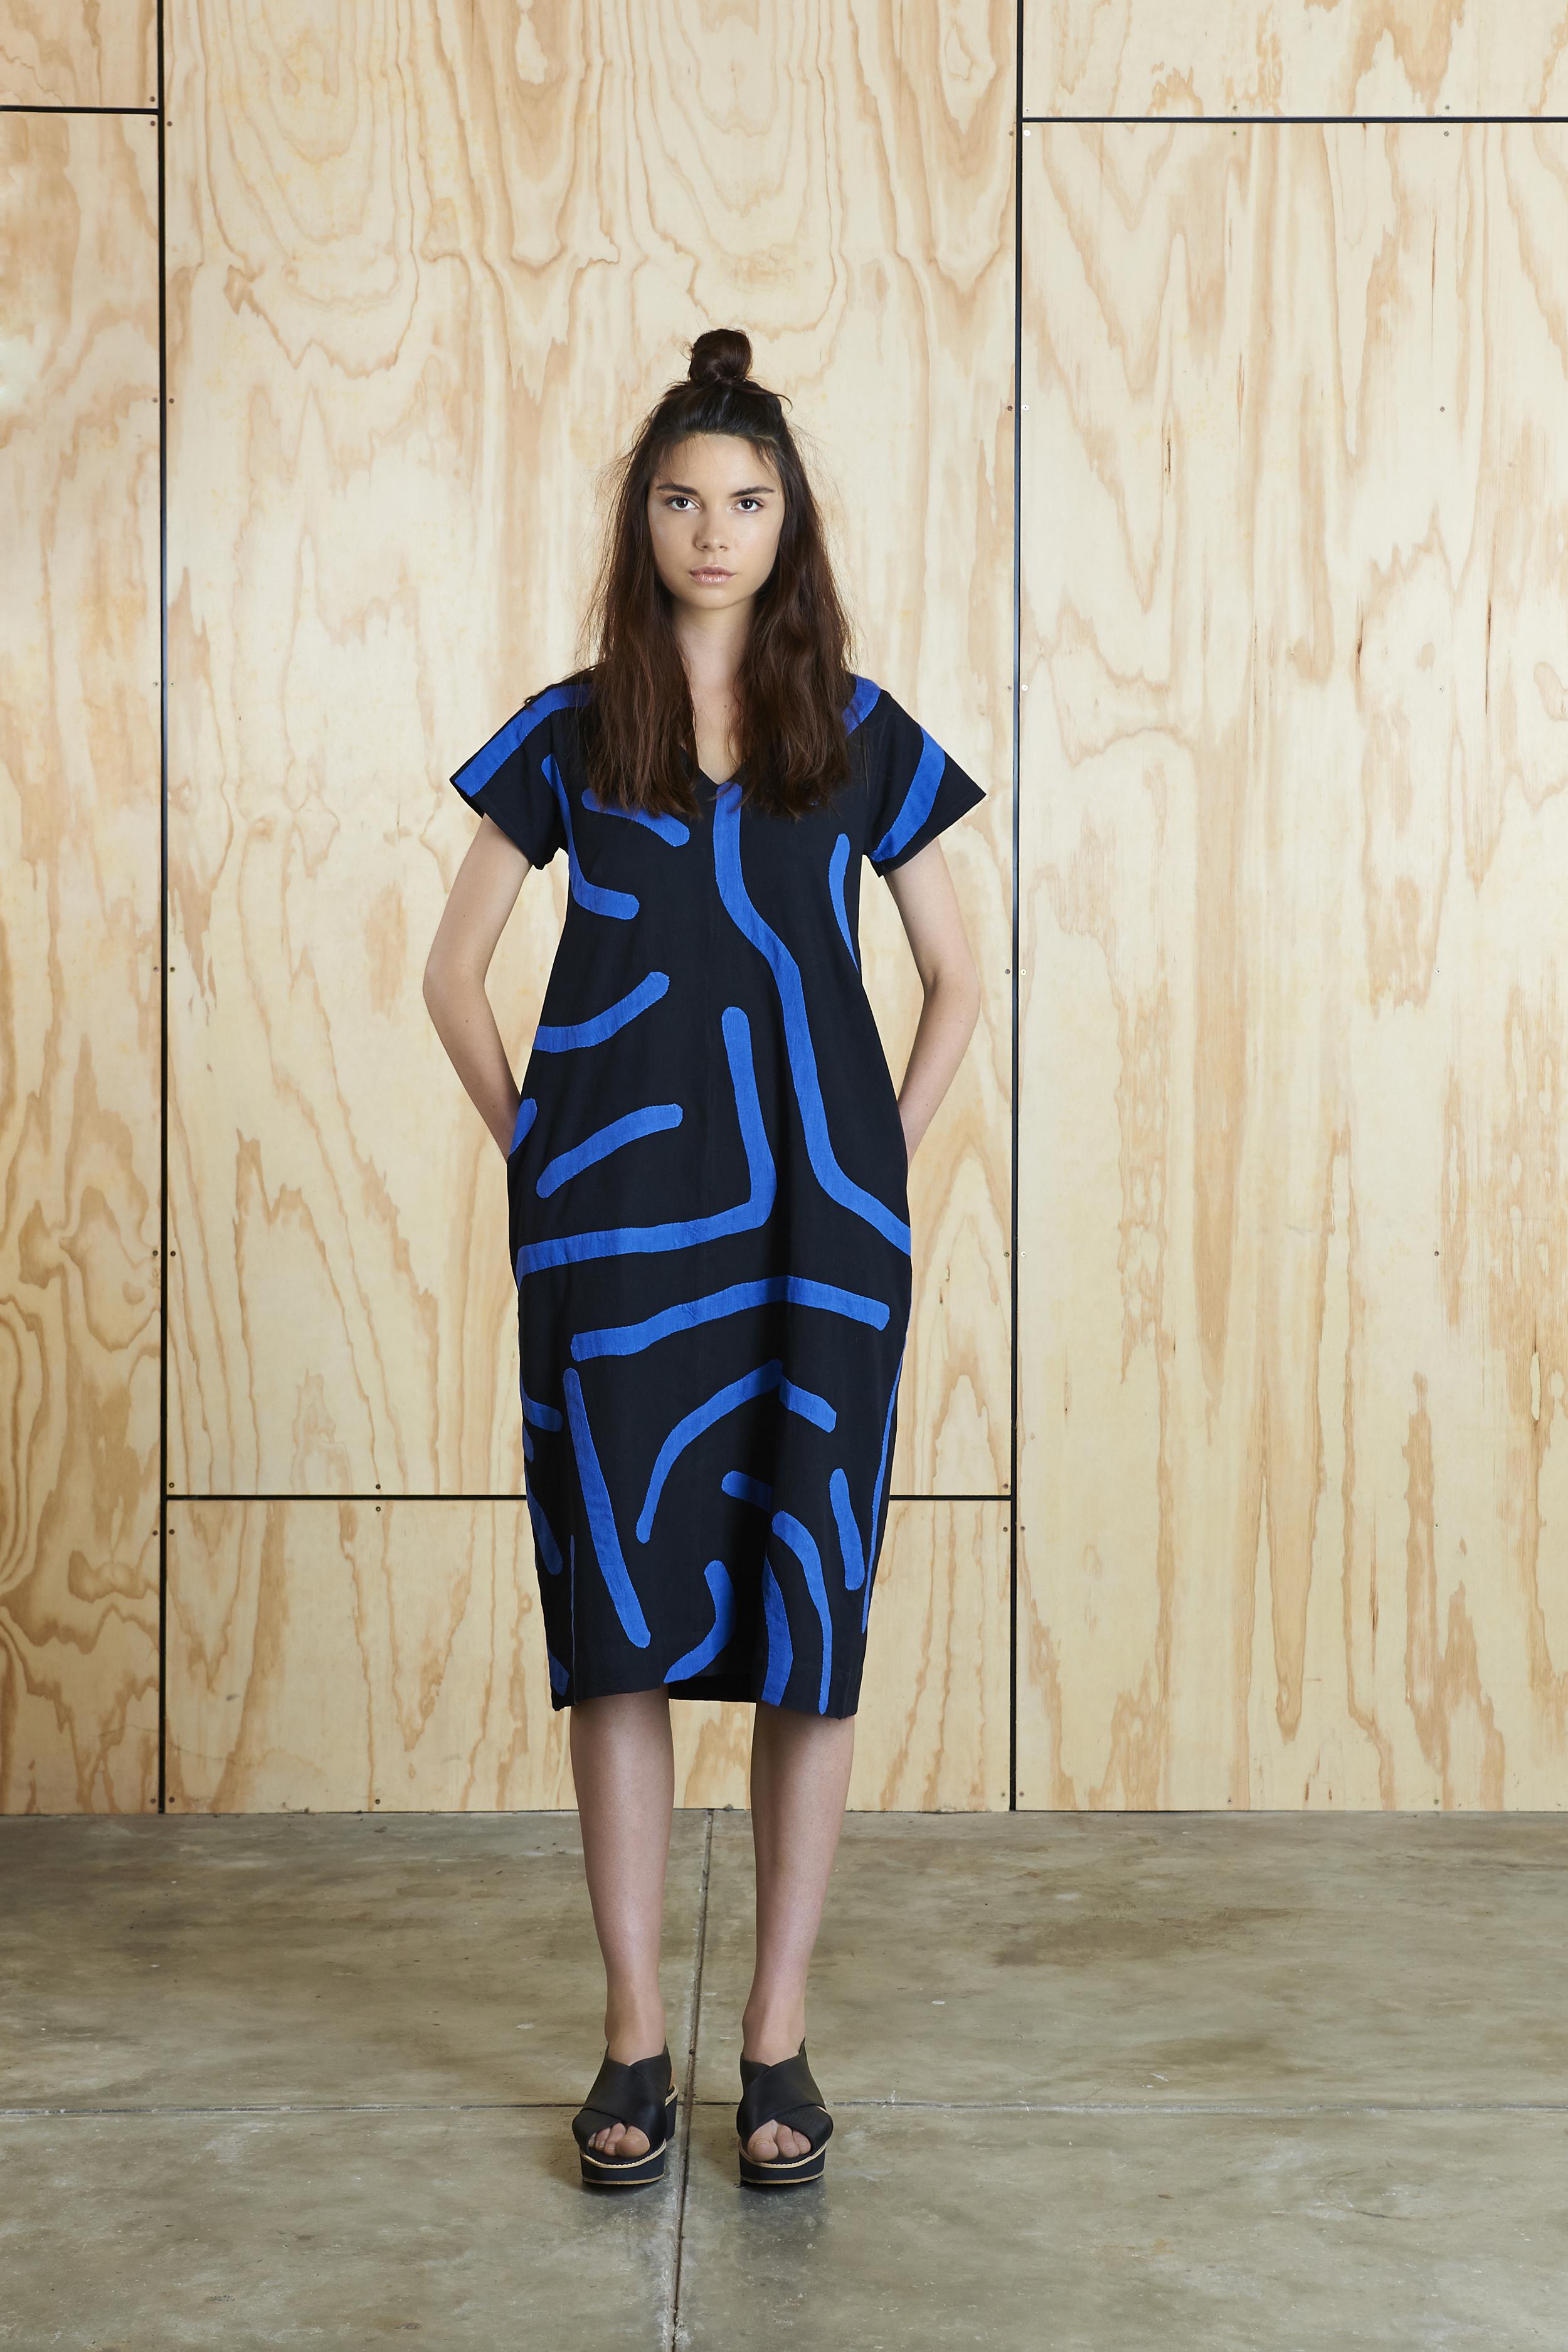 Big Creases Dress in Black/Blue  AUD $310